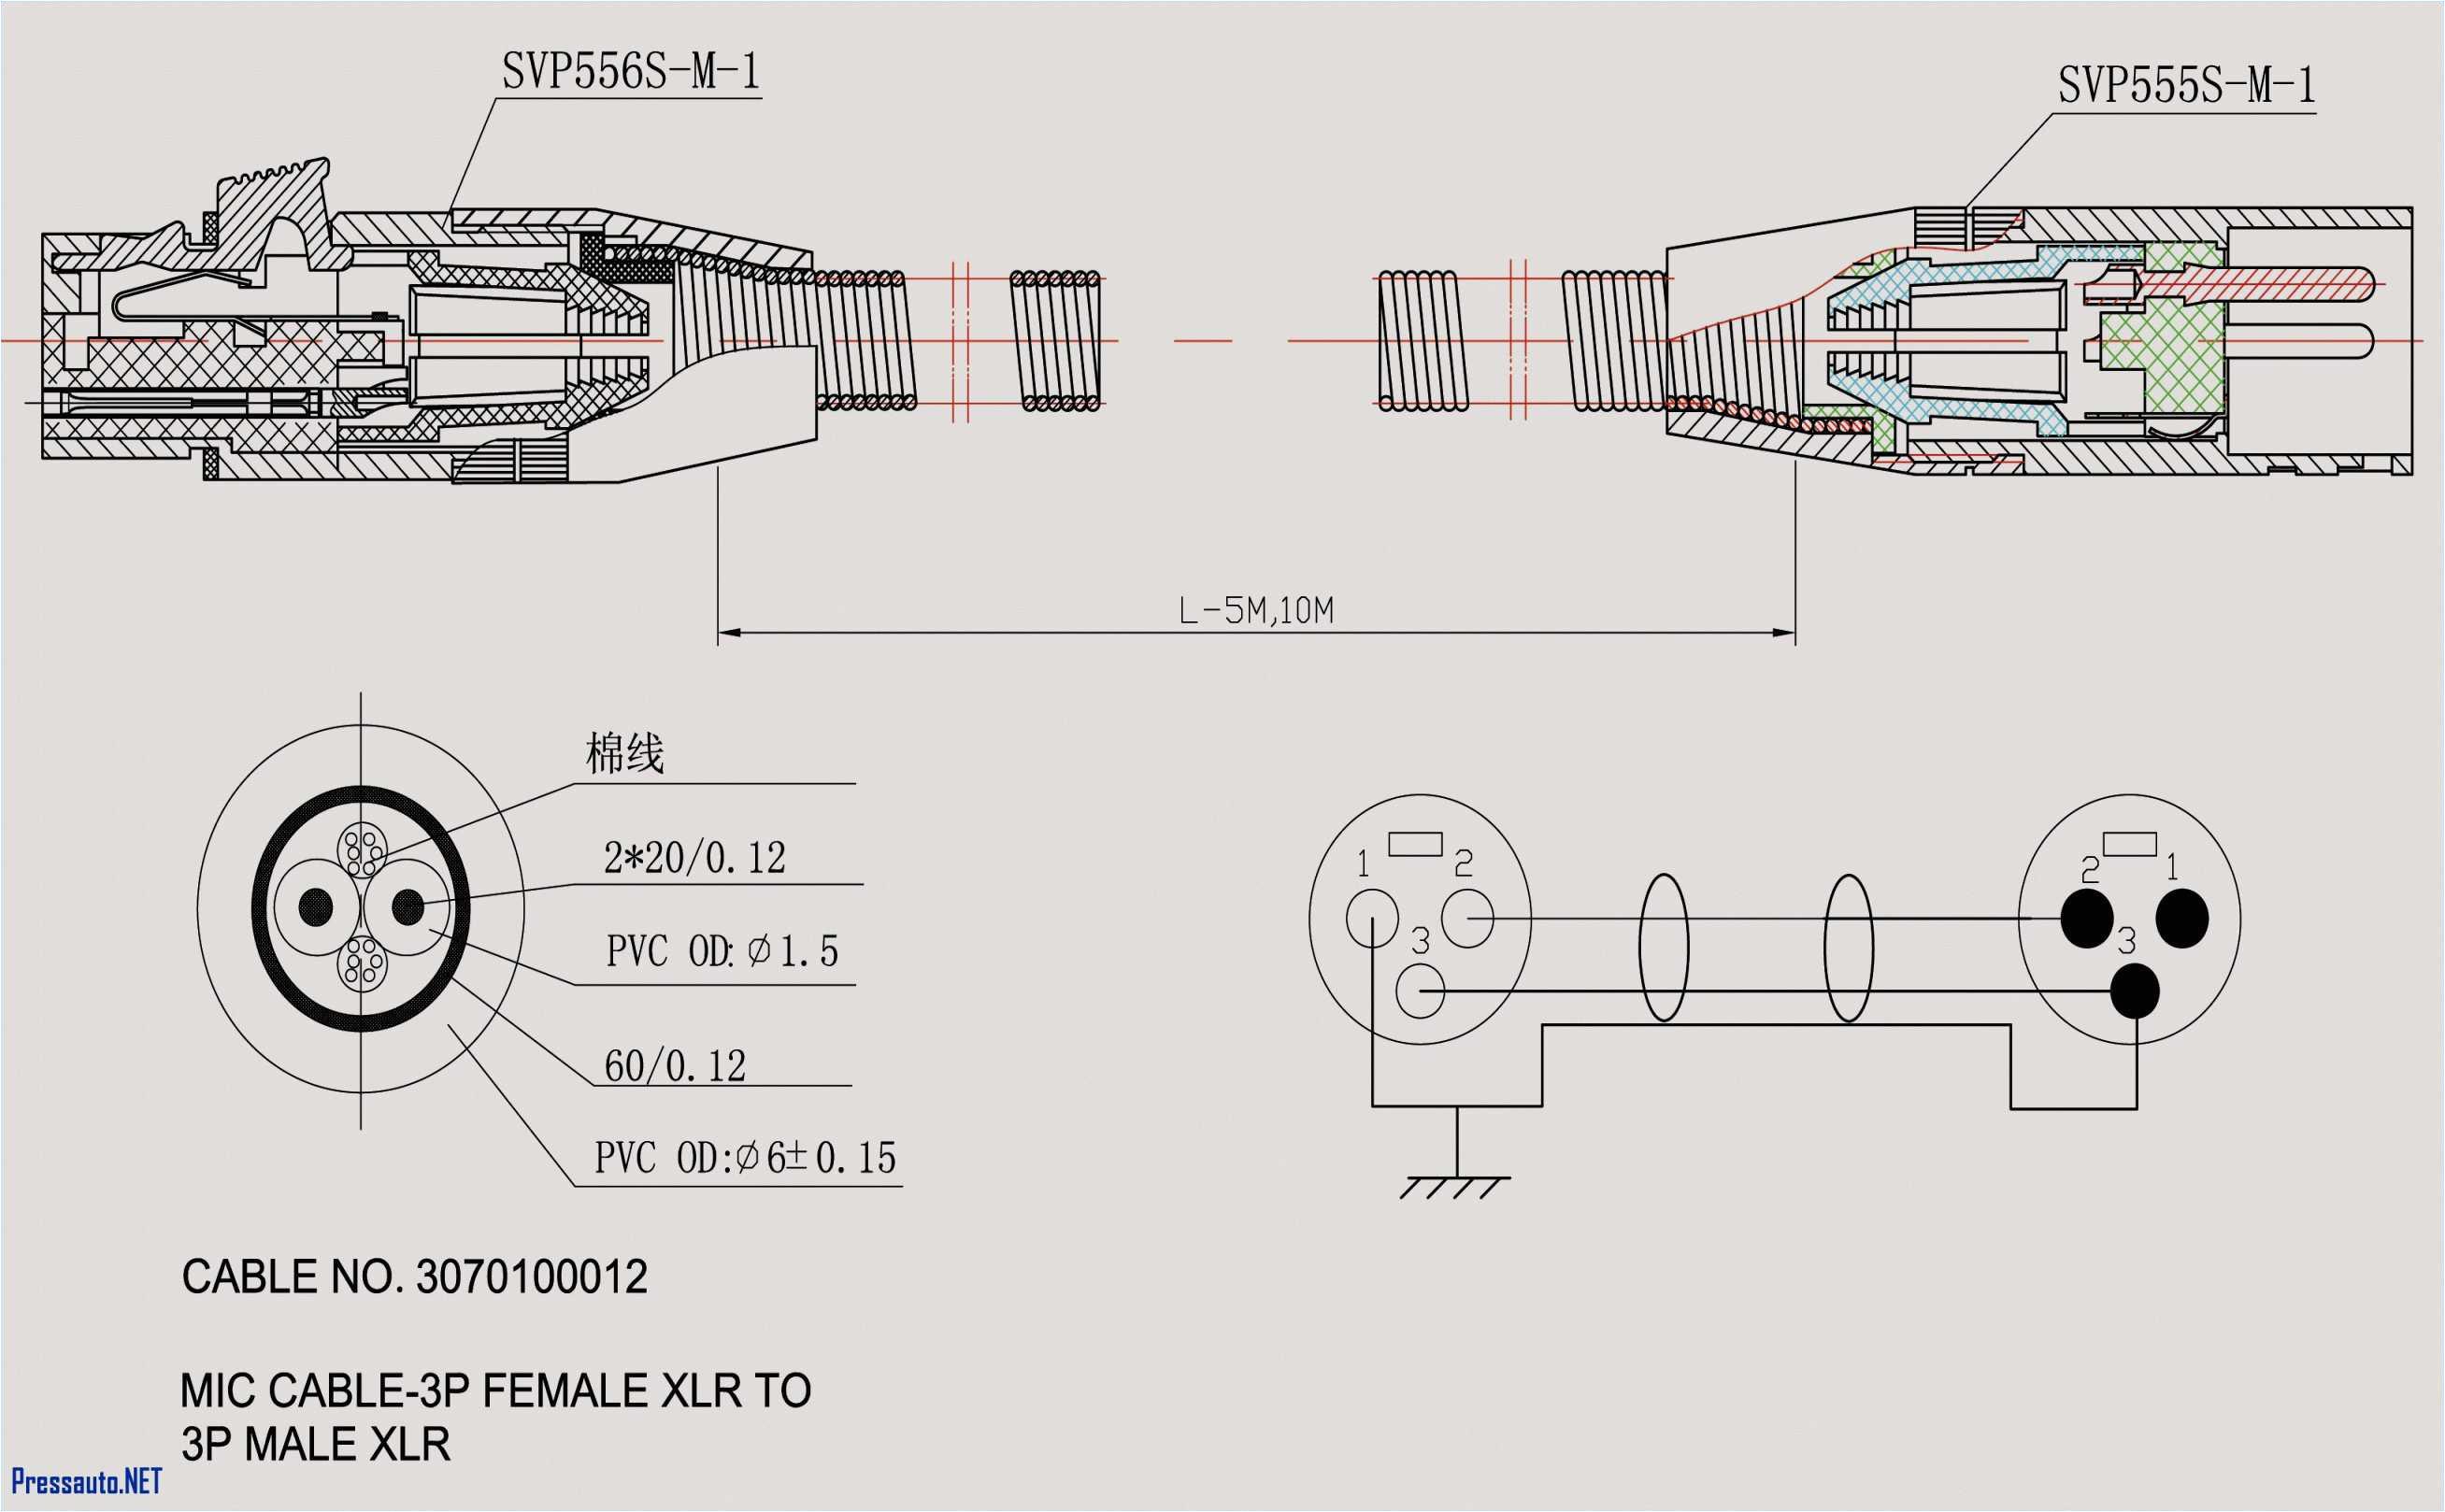 2005 gmc sierra stereo wiring diagram wiring diagrams 2005 gmc denali wiring diagram